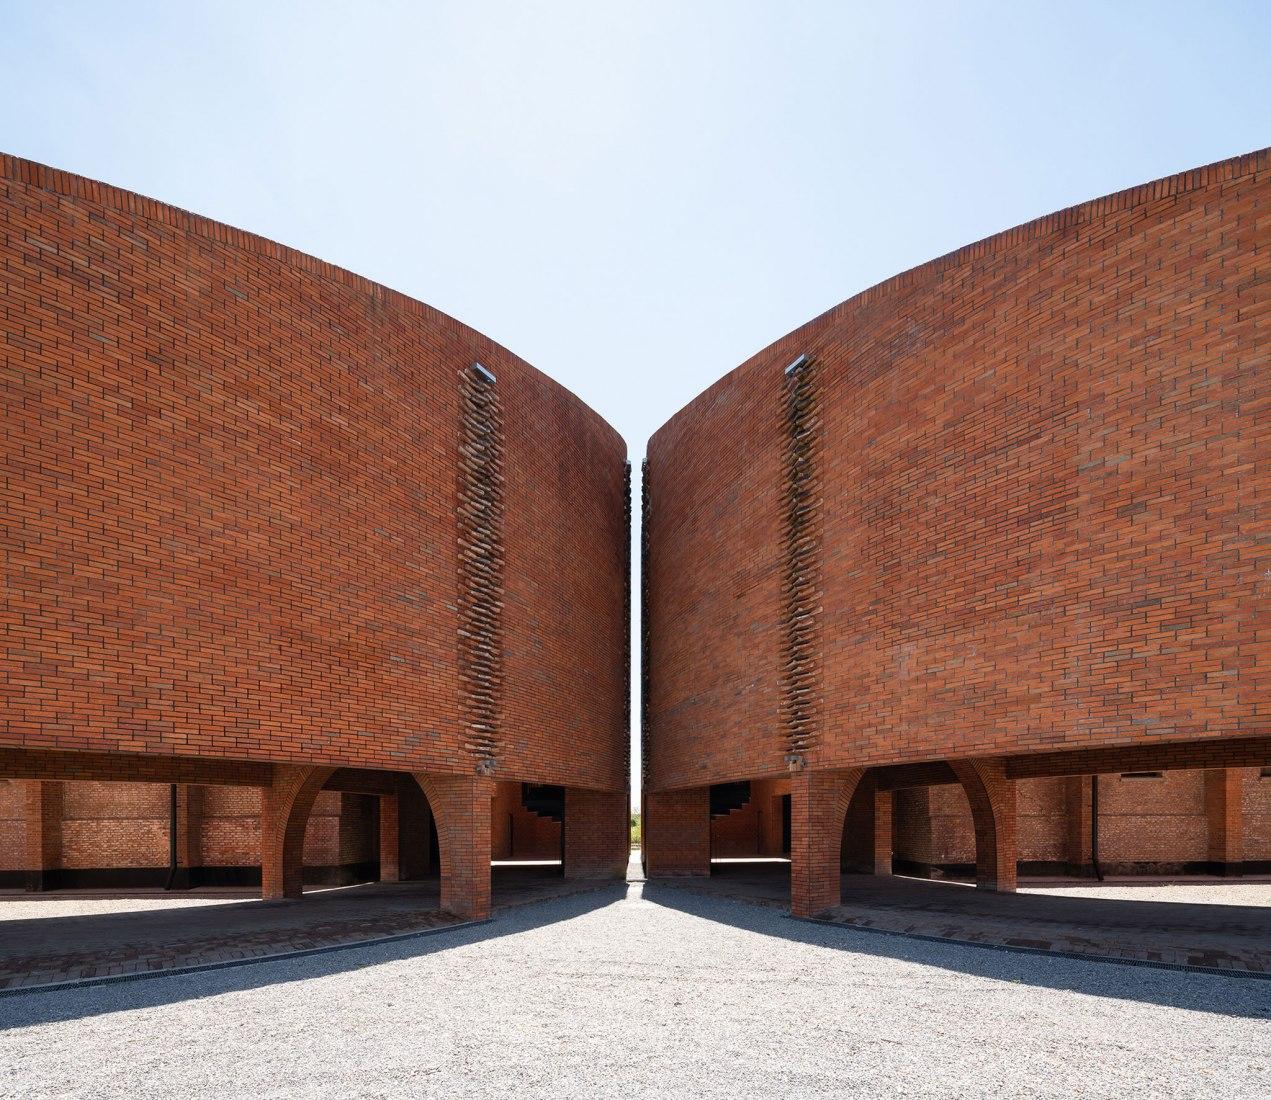 Centro de Arte TaoCang por Roarc Renew. Fotografía por Wen Studio